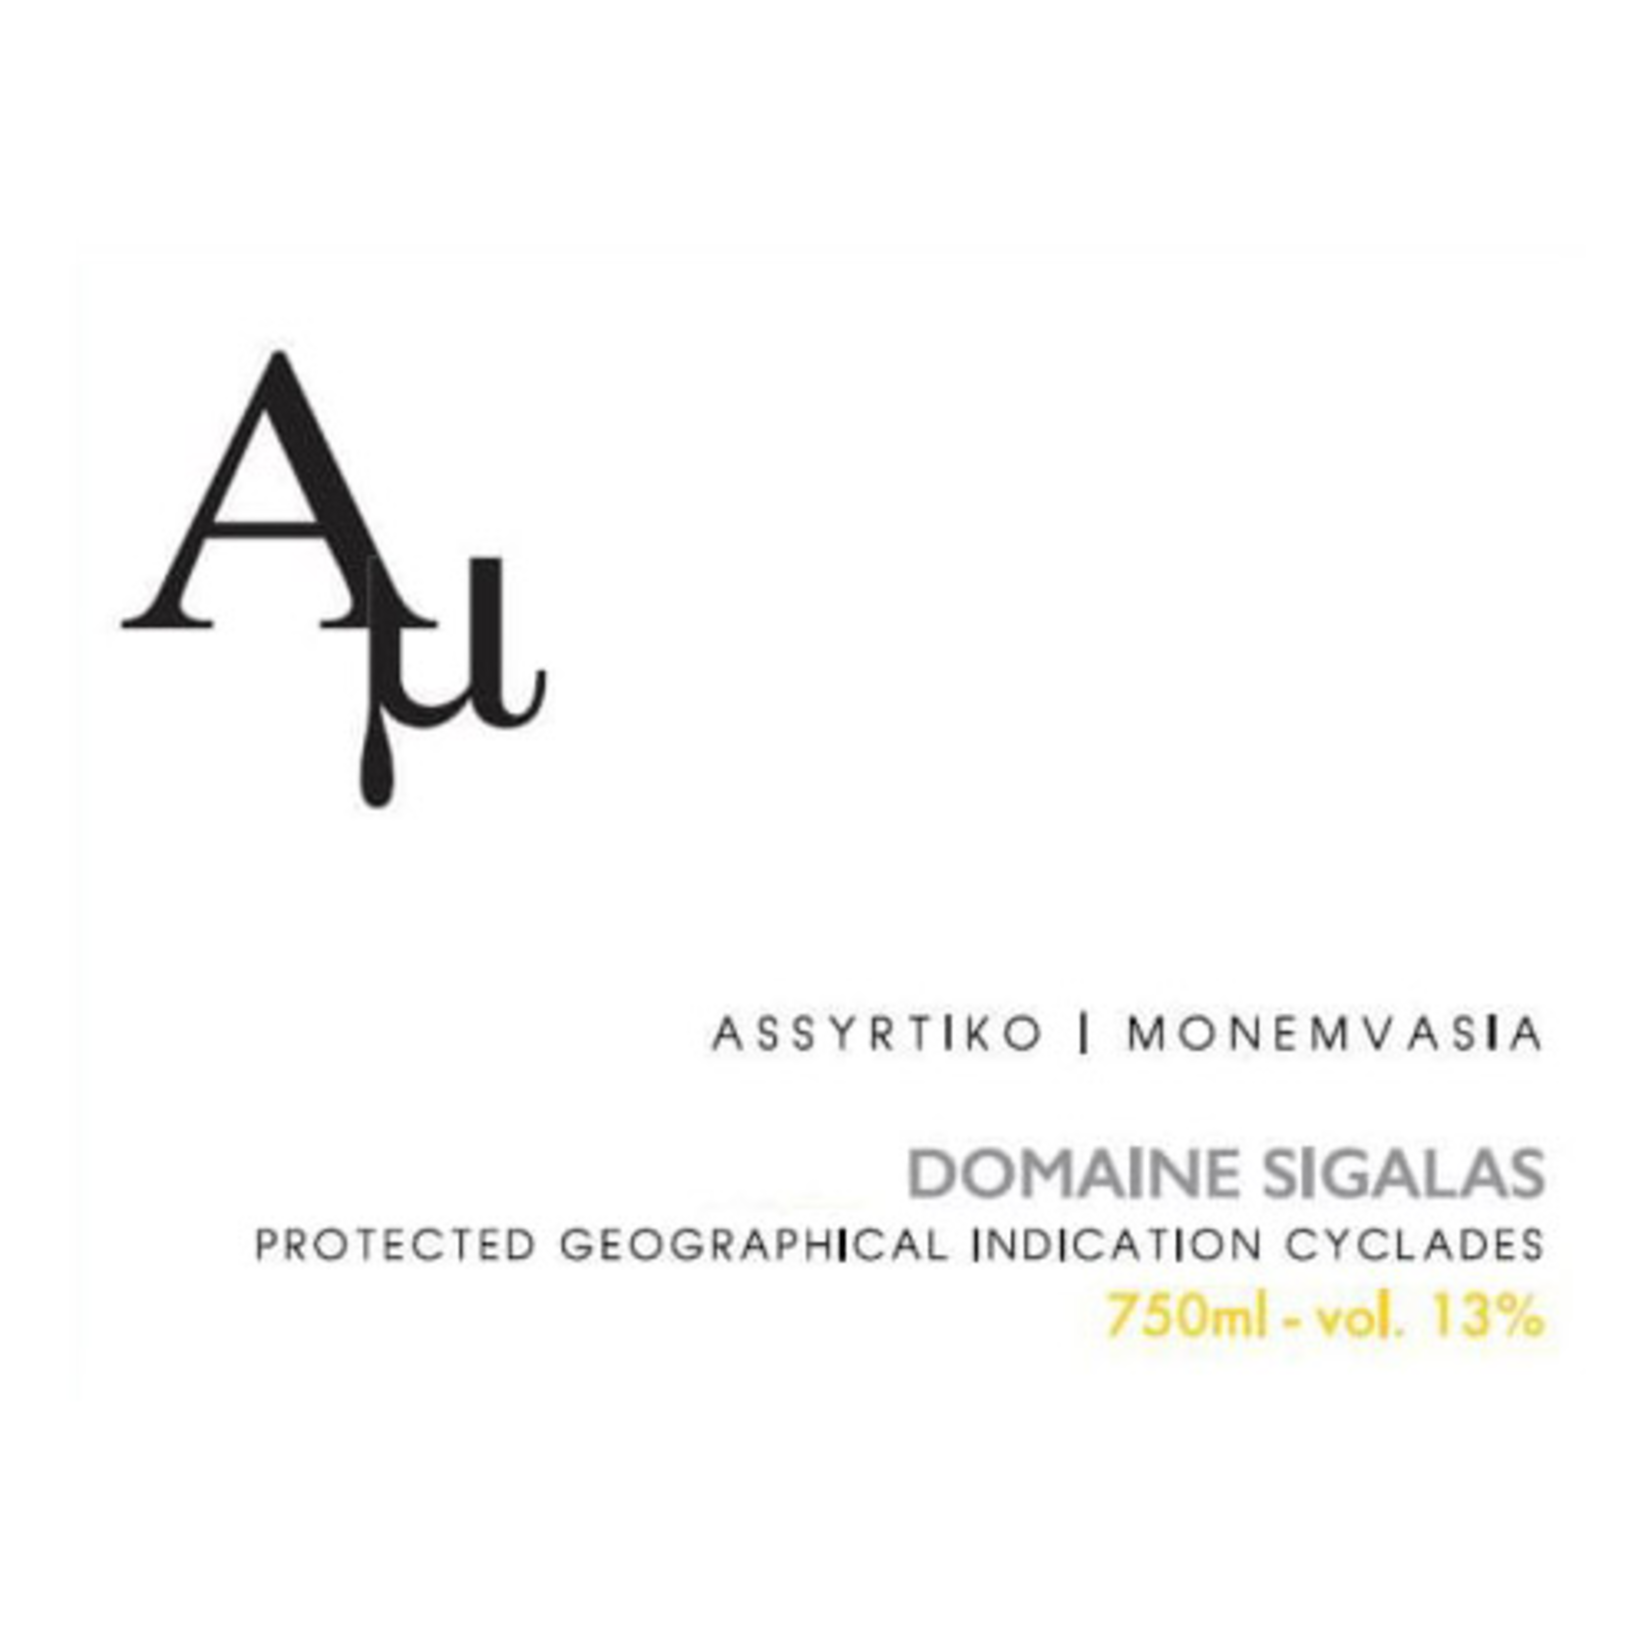 Wine Domaine Sigalas Cyclades Assyrtiko Monemvasia 2019